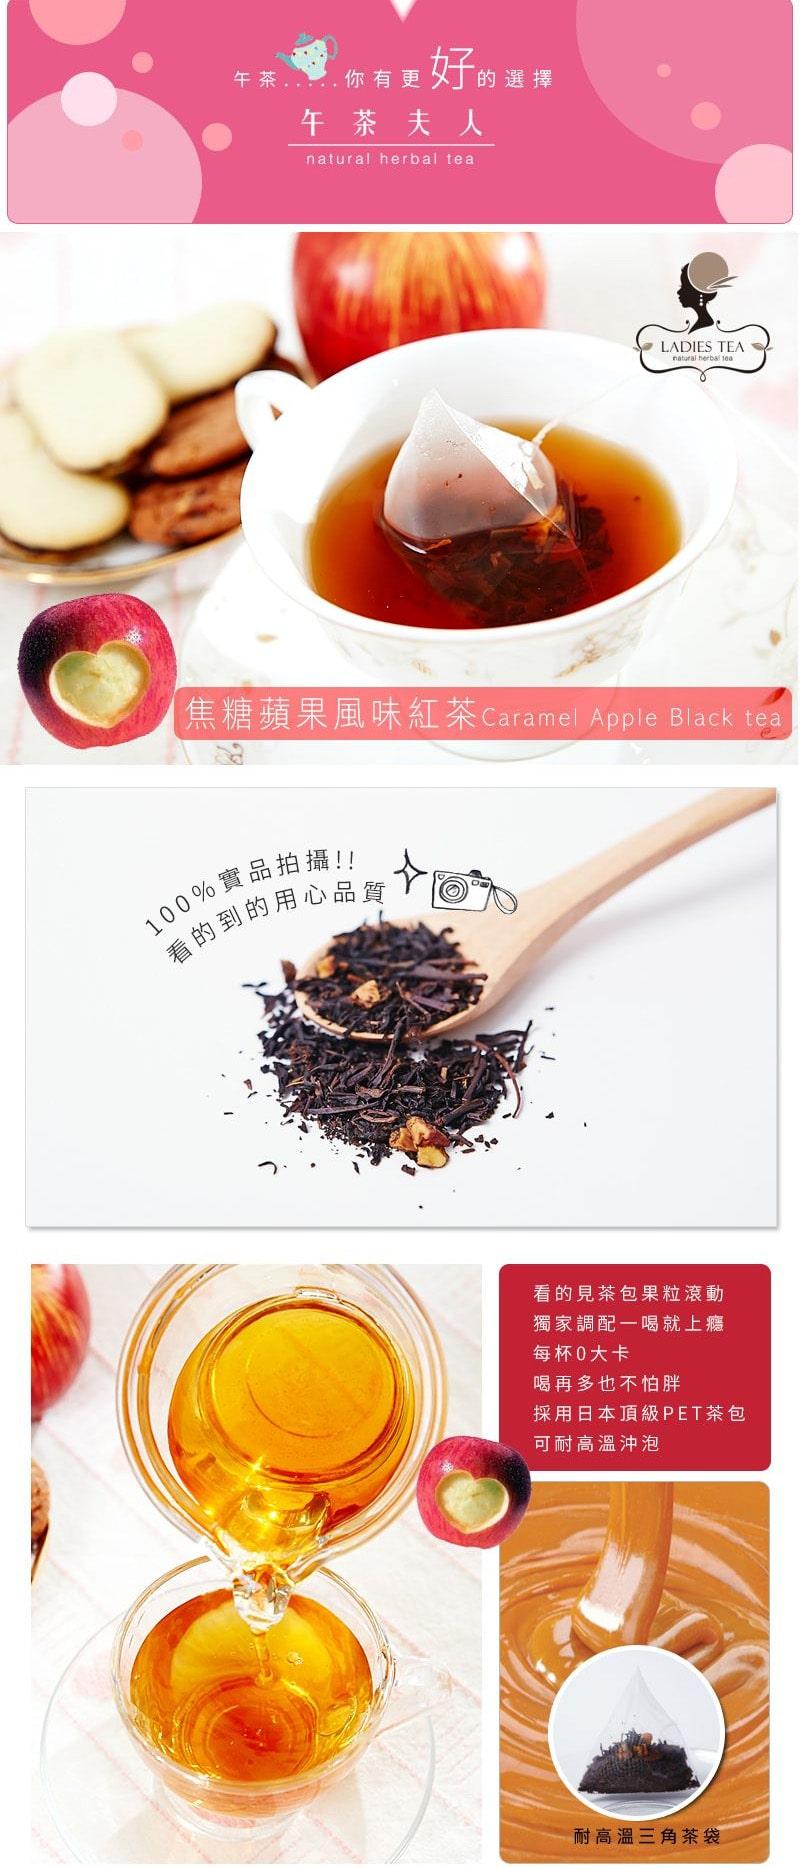 Caramel Apple Black Tea - Intro